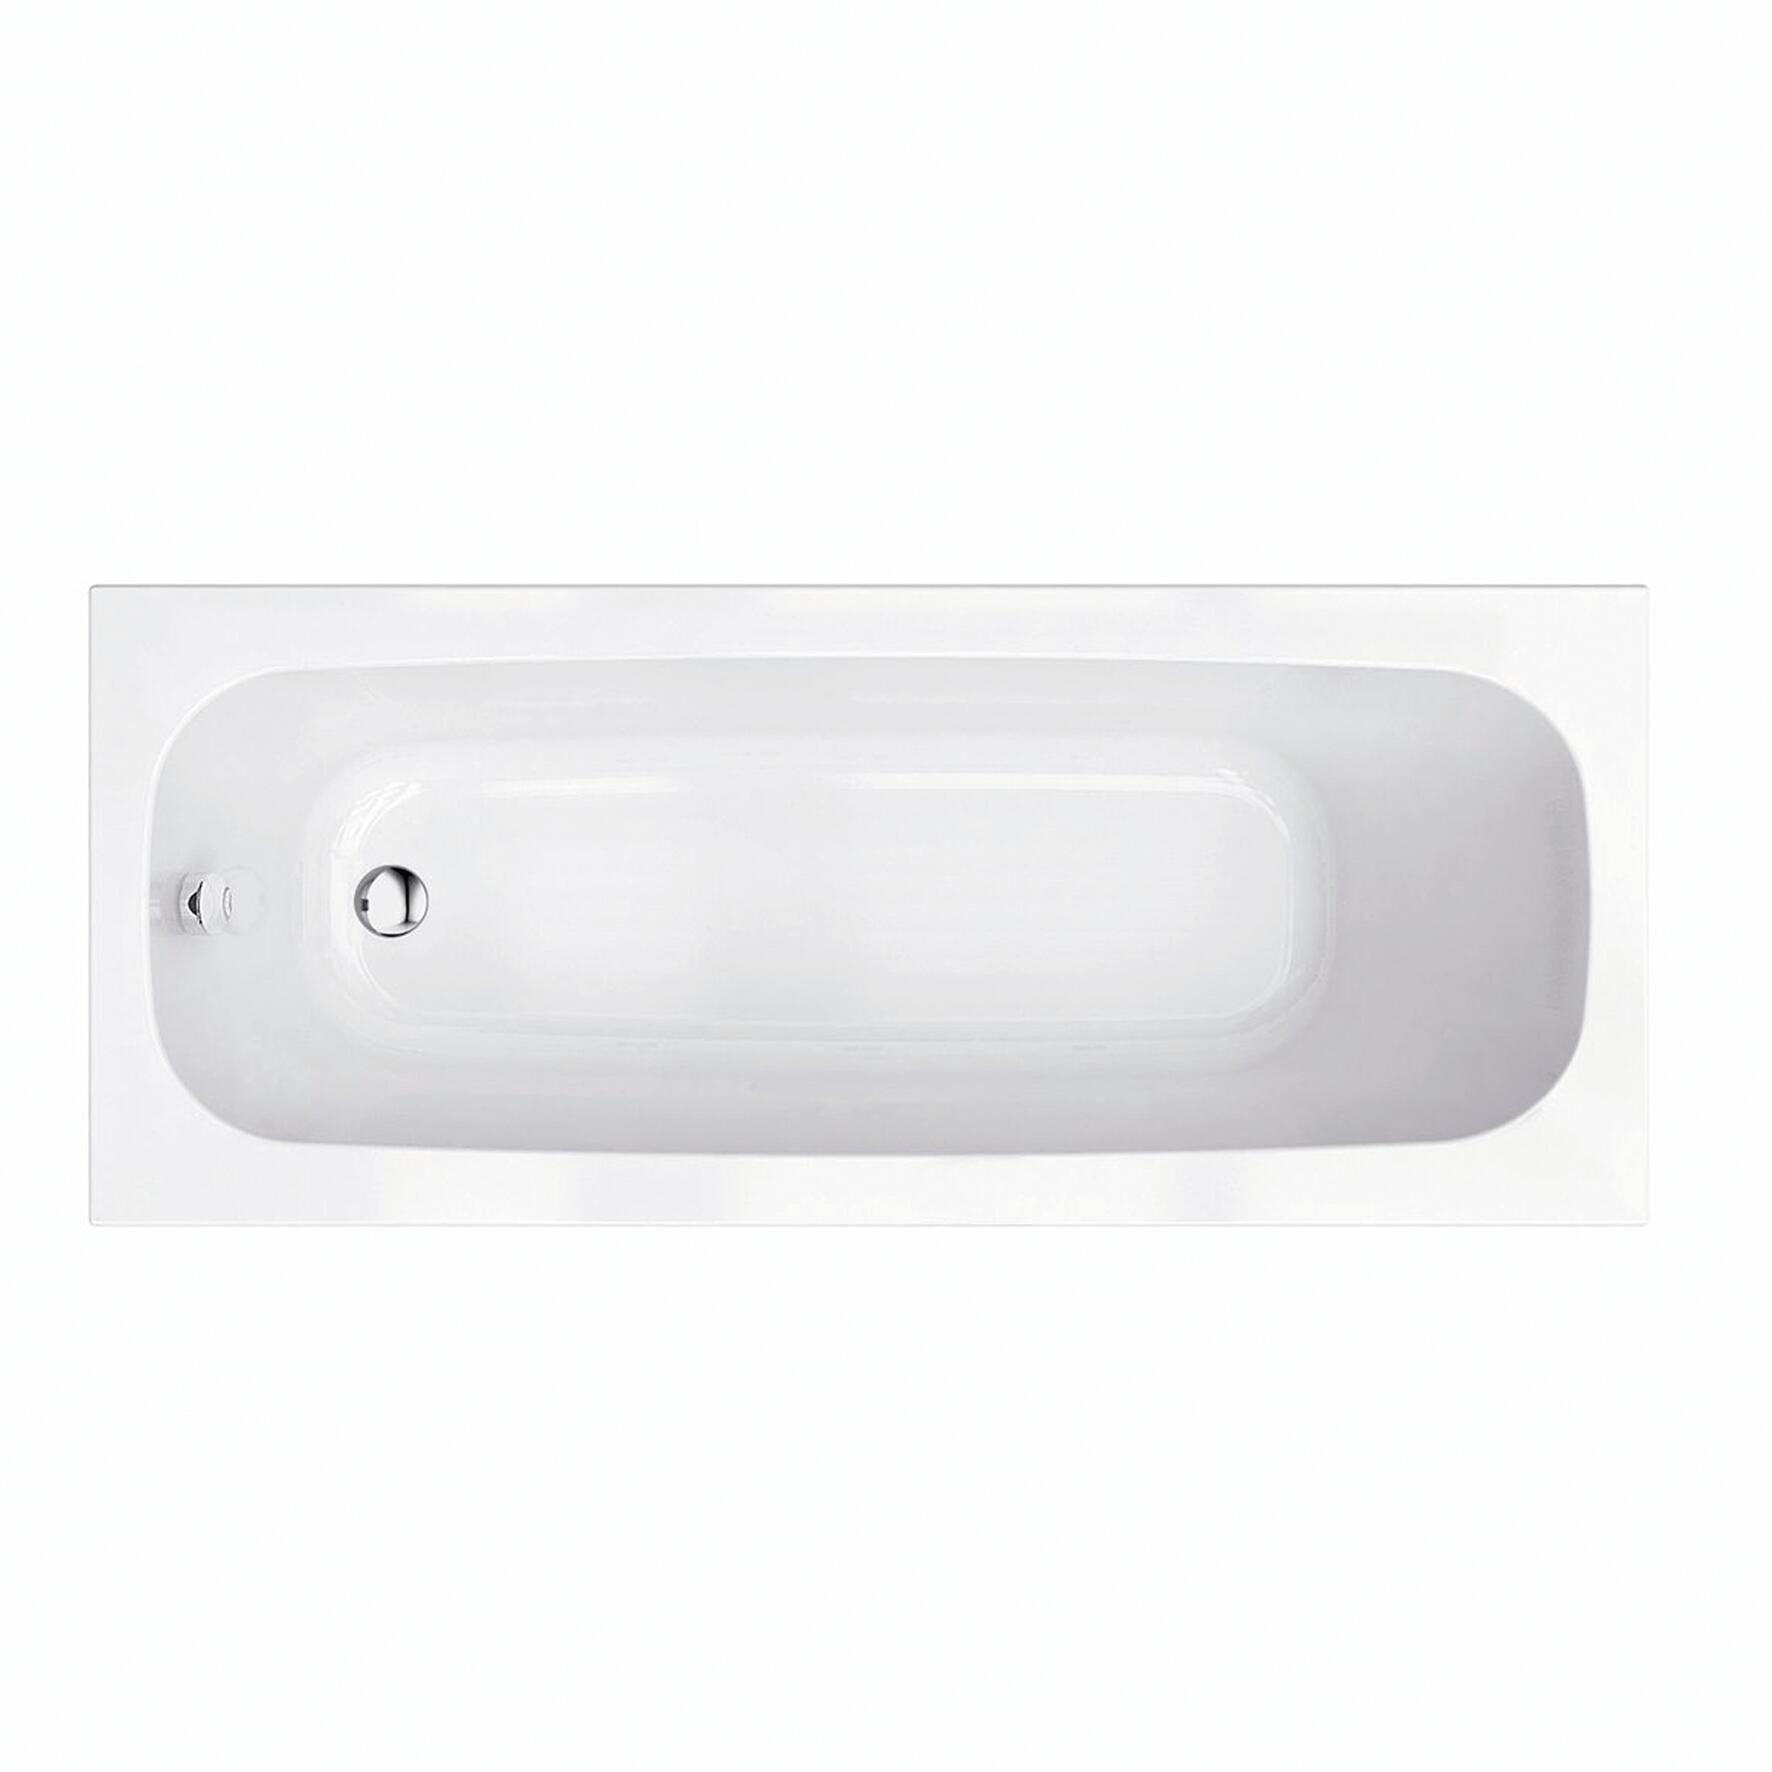 Vasca rettangolare Tag bianco 70 x 170 cm - 1